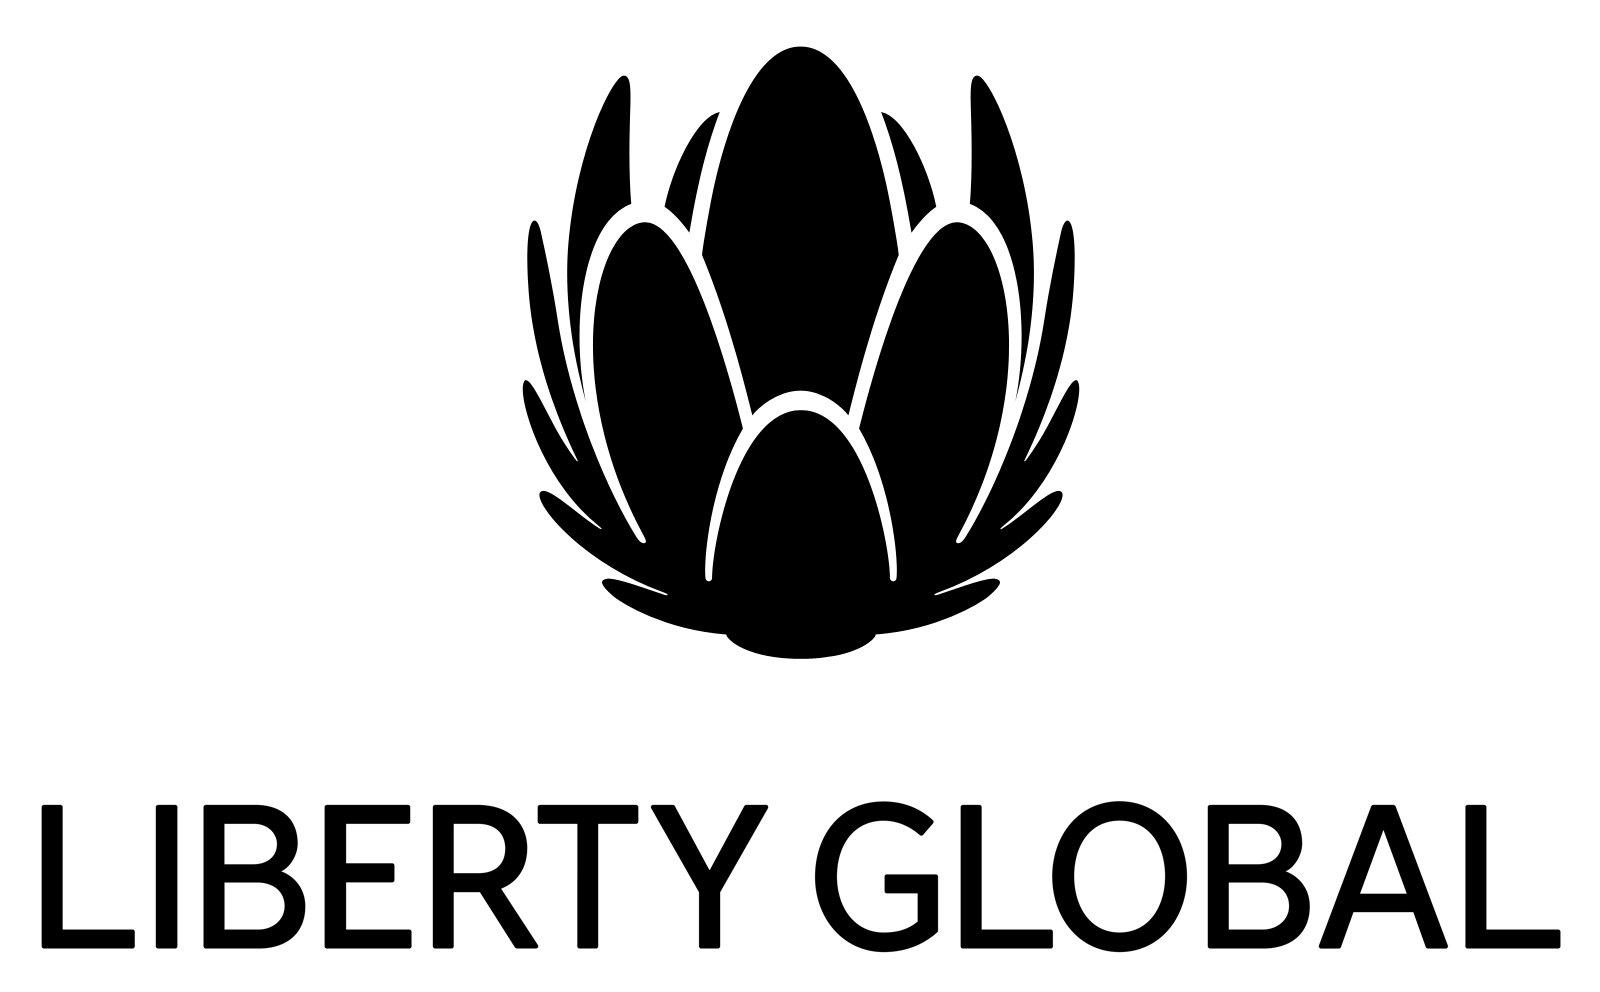 petrobras-energia-participaciones-sa-logo.jpg ladbrokes plc analyst ratings, earnings, dividends insider